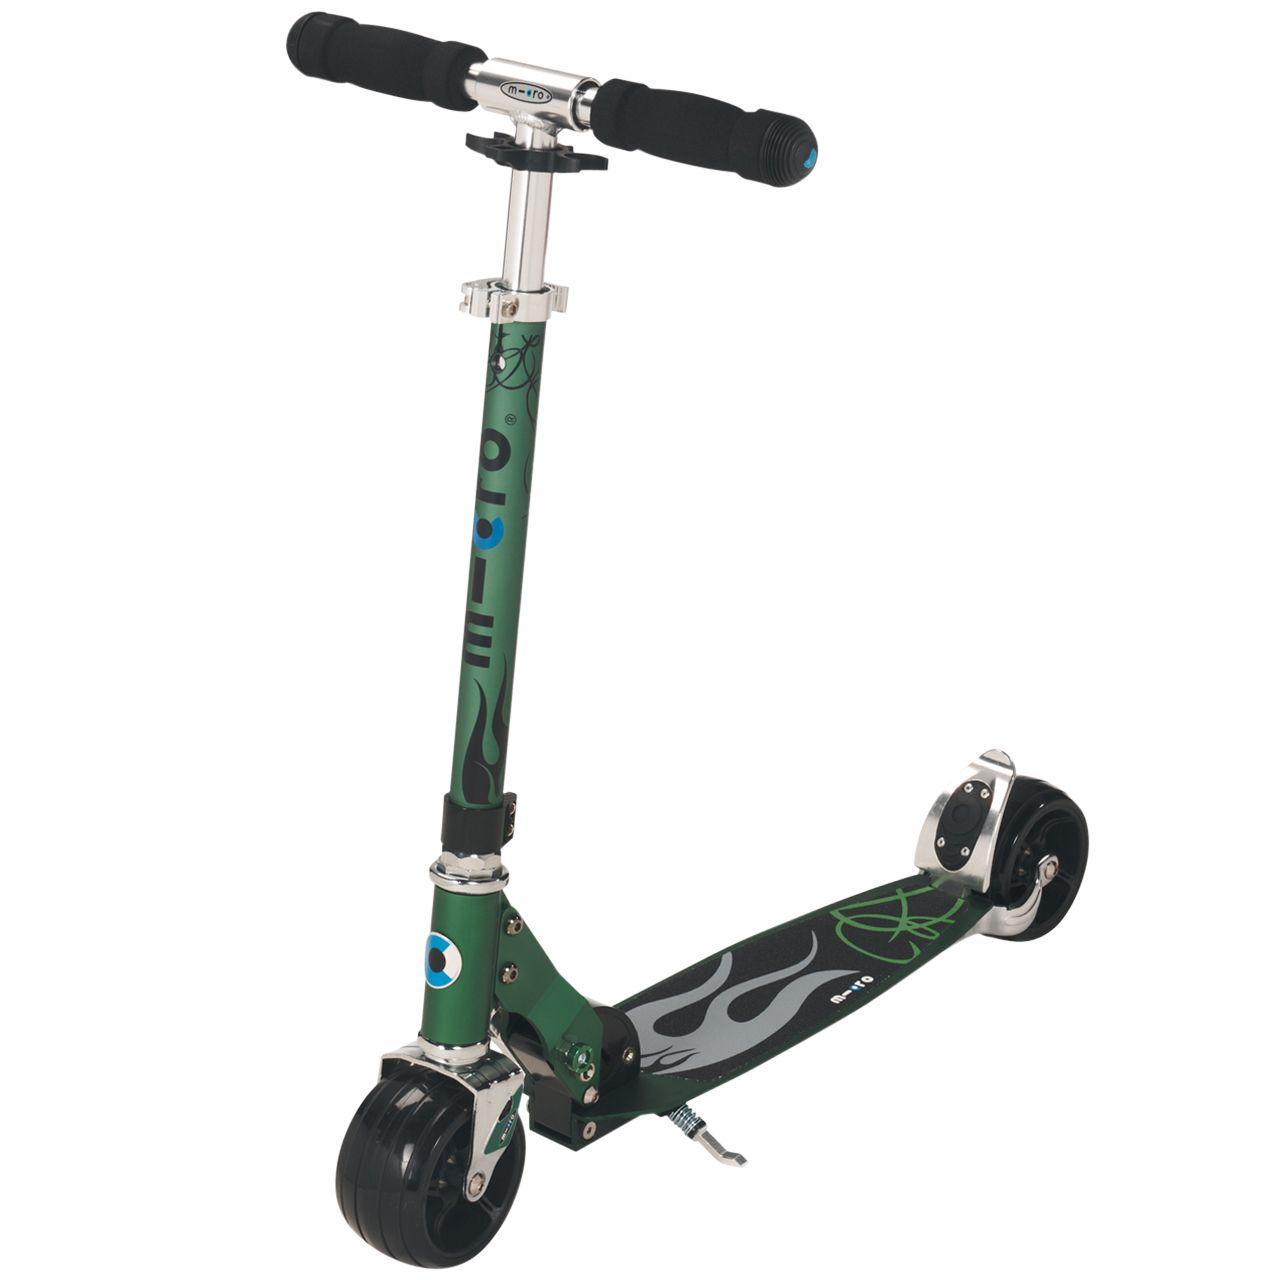 Micro Rocket Aluminium Scooter, Green